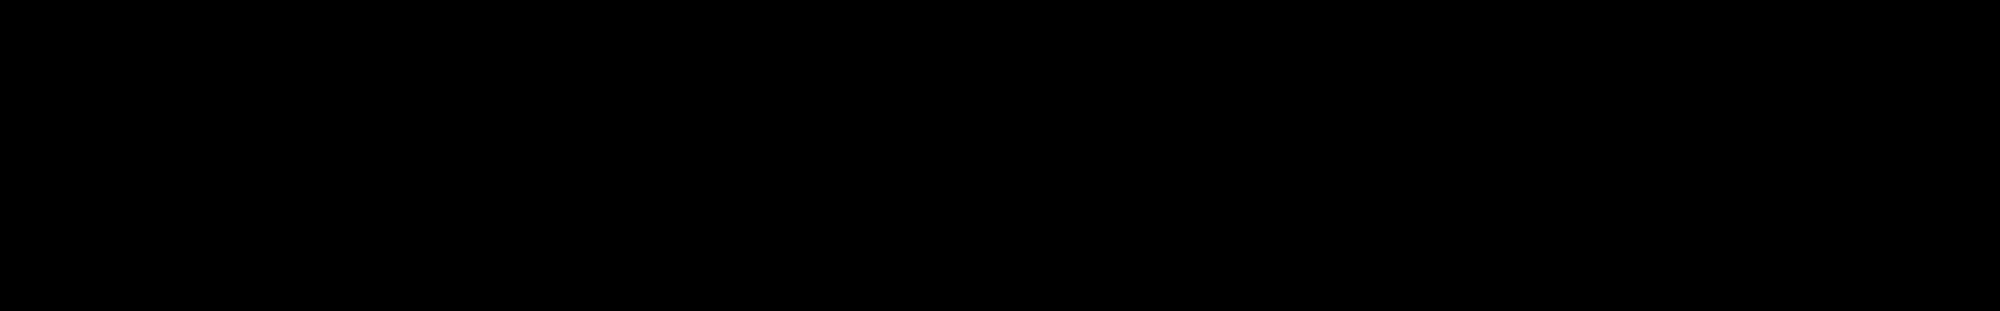 Logo - Pegatron